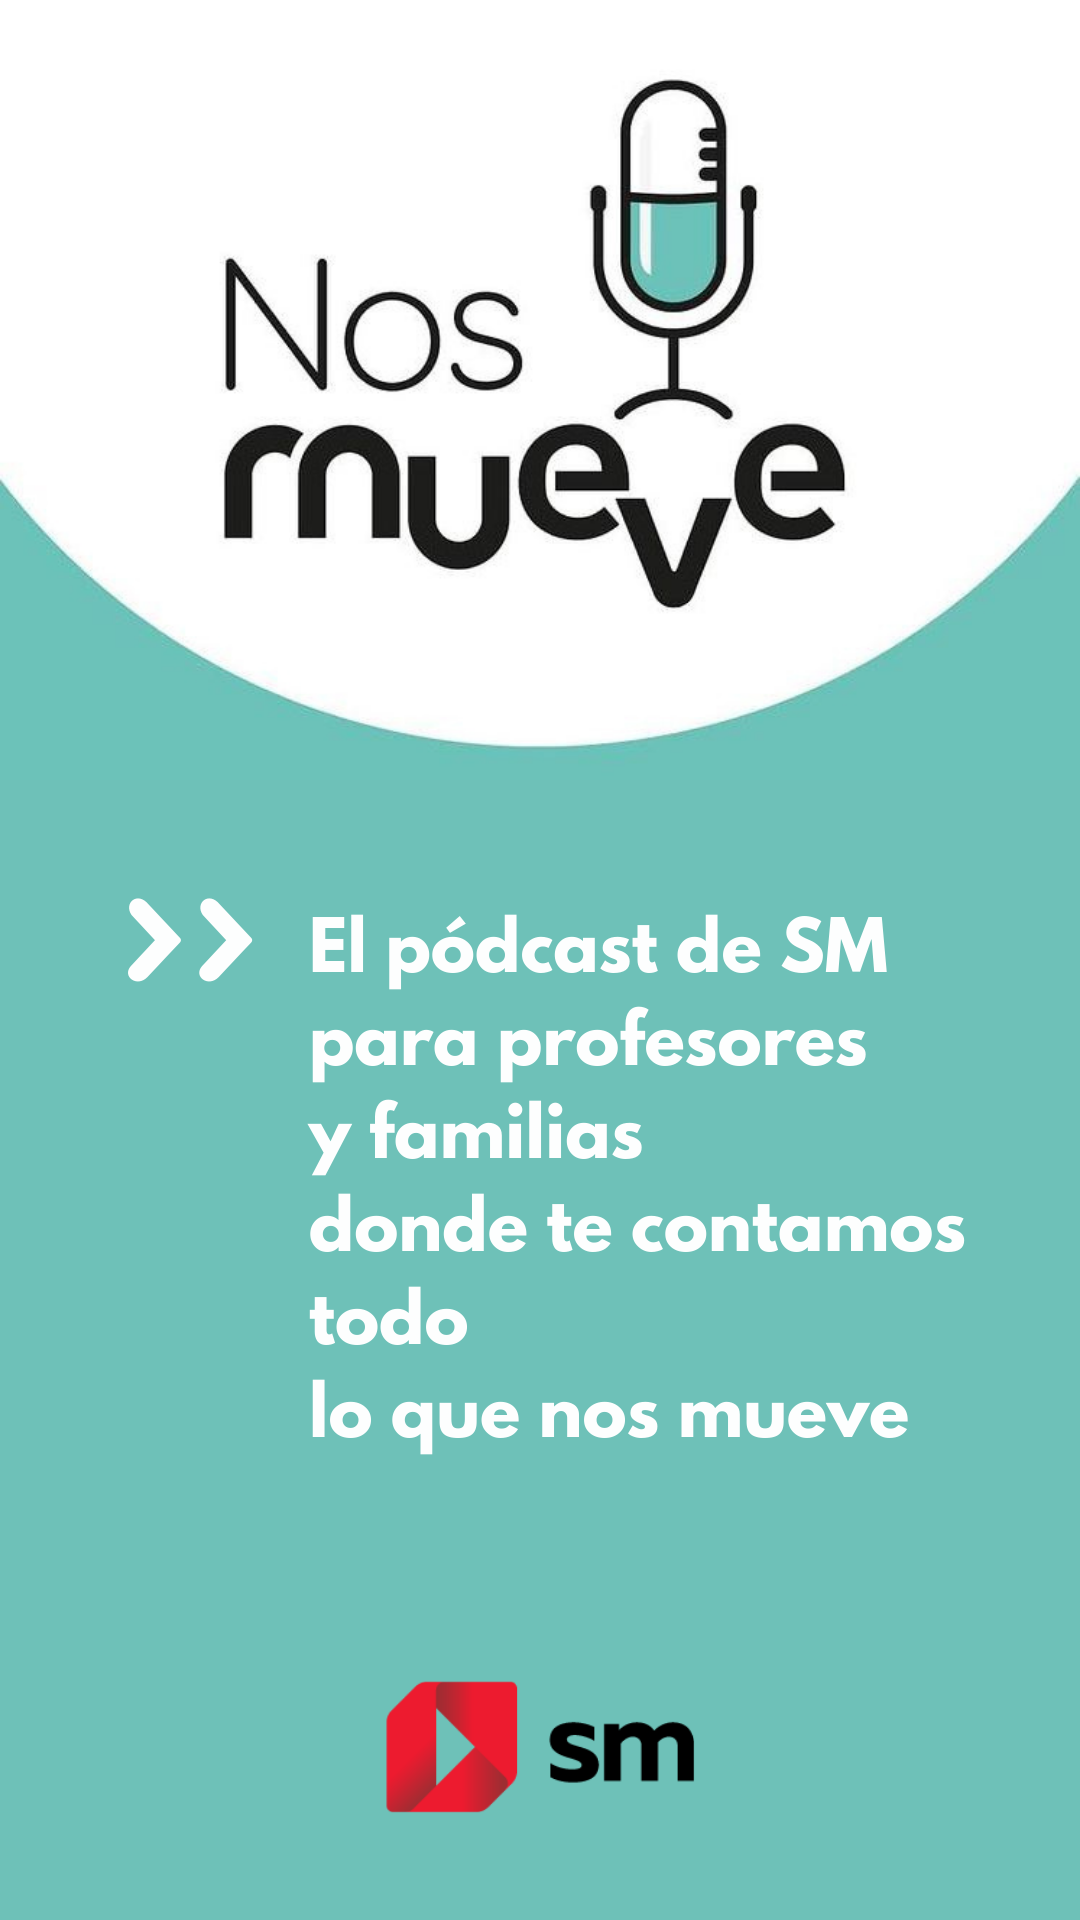 Nos Mueve, el pódcast de SM